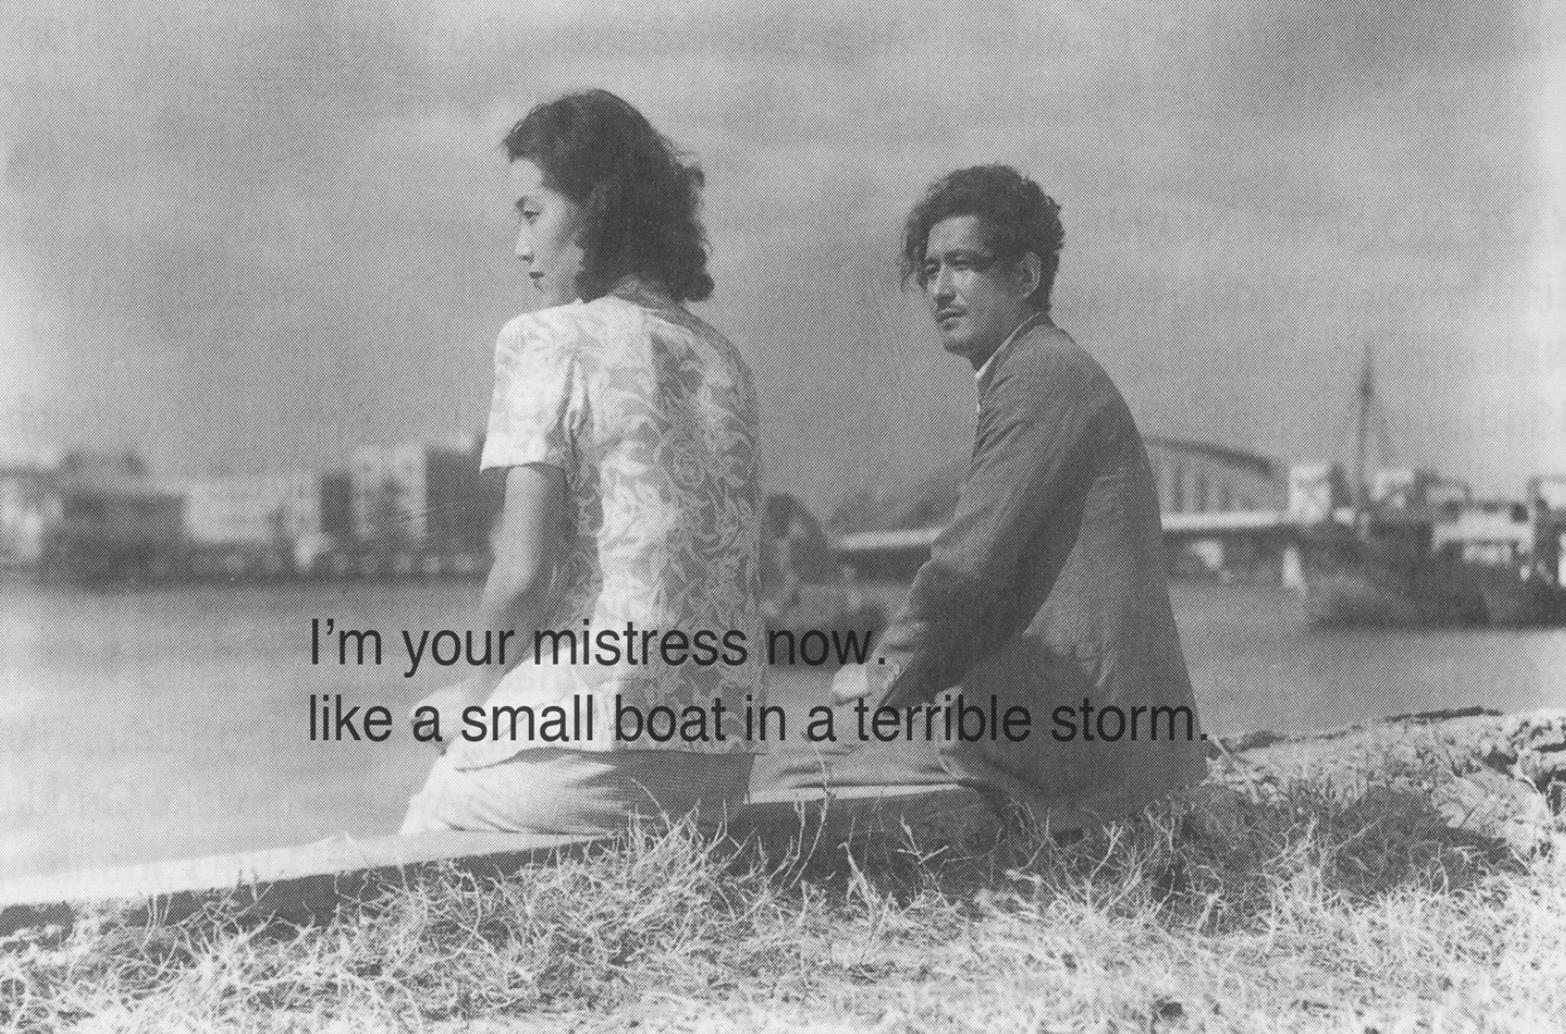 Cracknell_Ozu film still-Kim Ki-Young dialogue.png